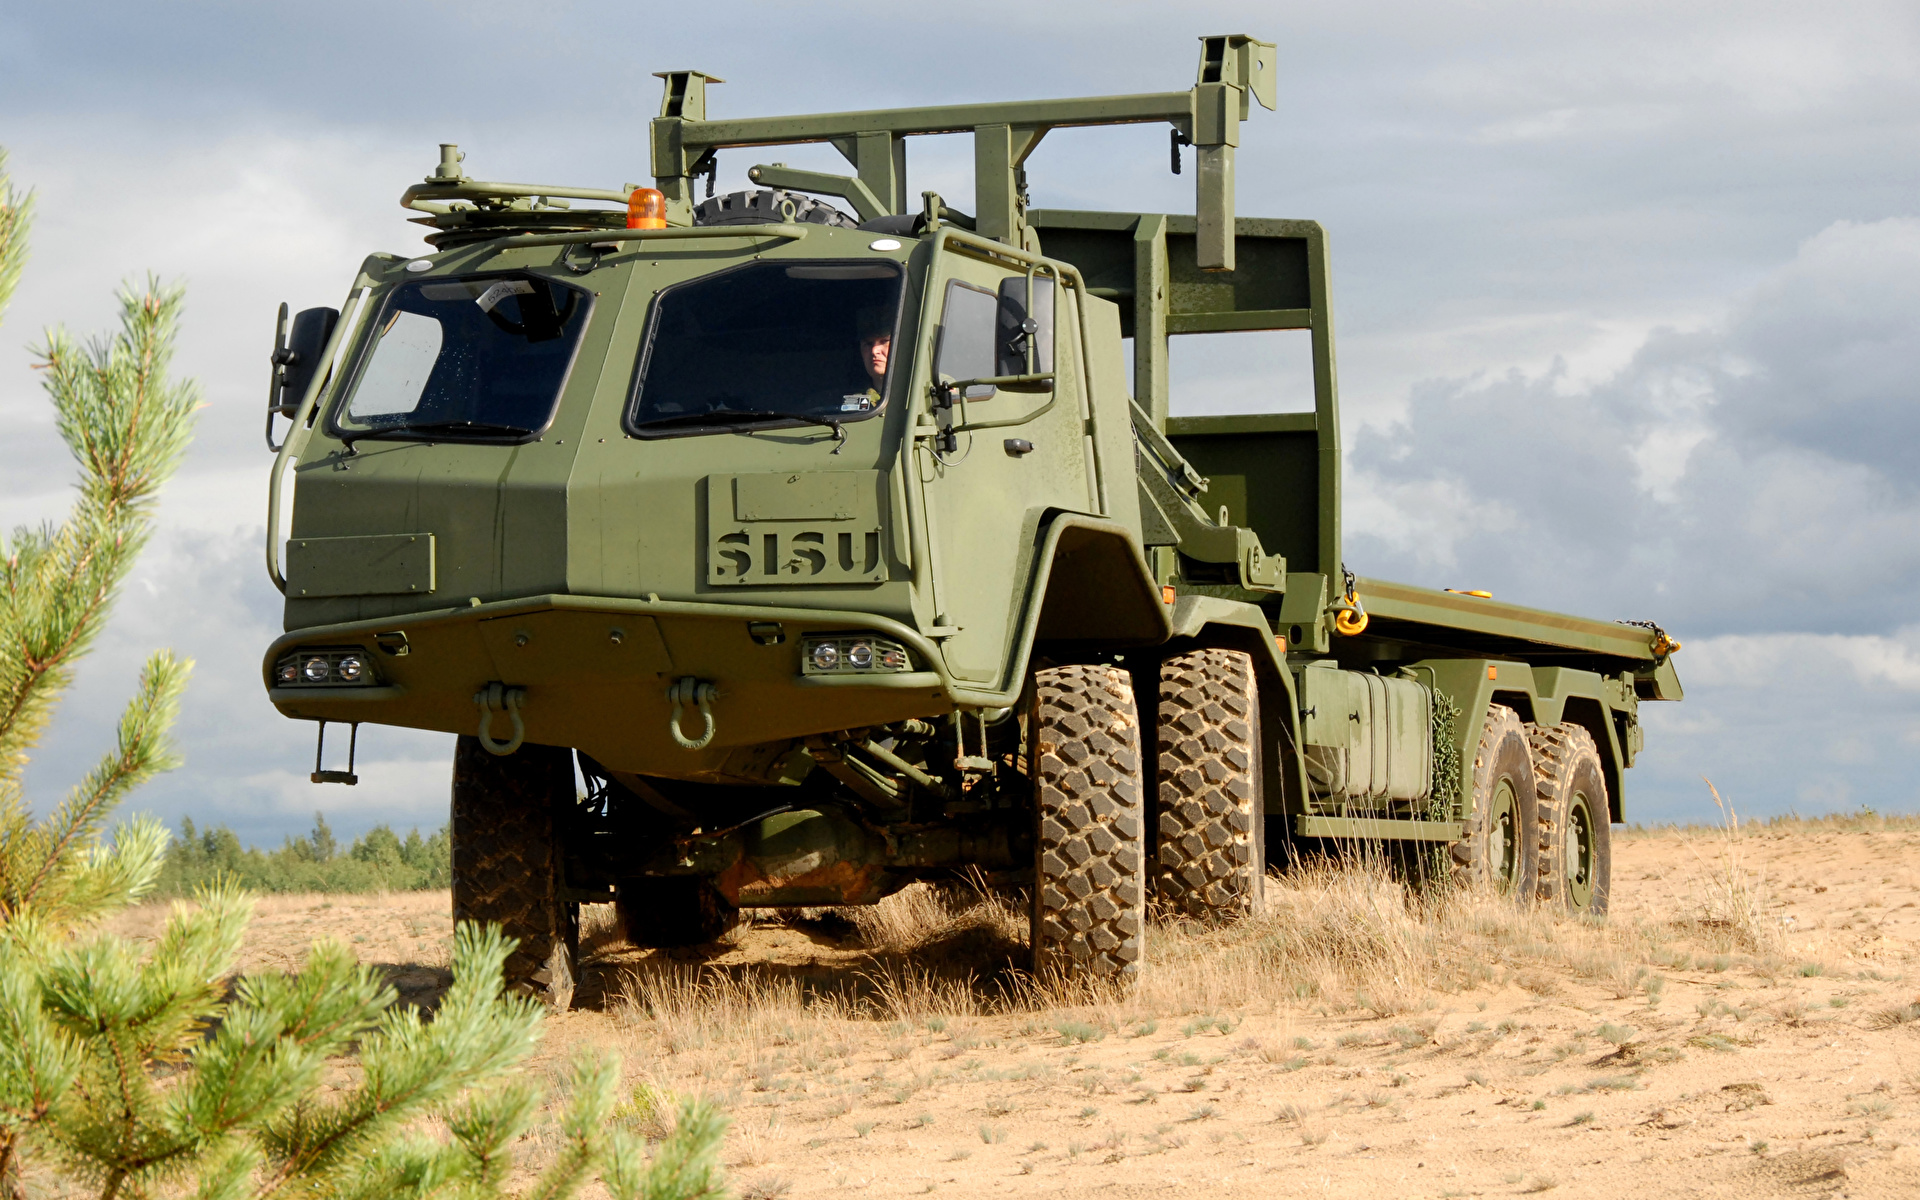 1920x1200、貨物自動車、戦闘車両、、自動車、陸軍、